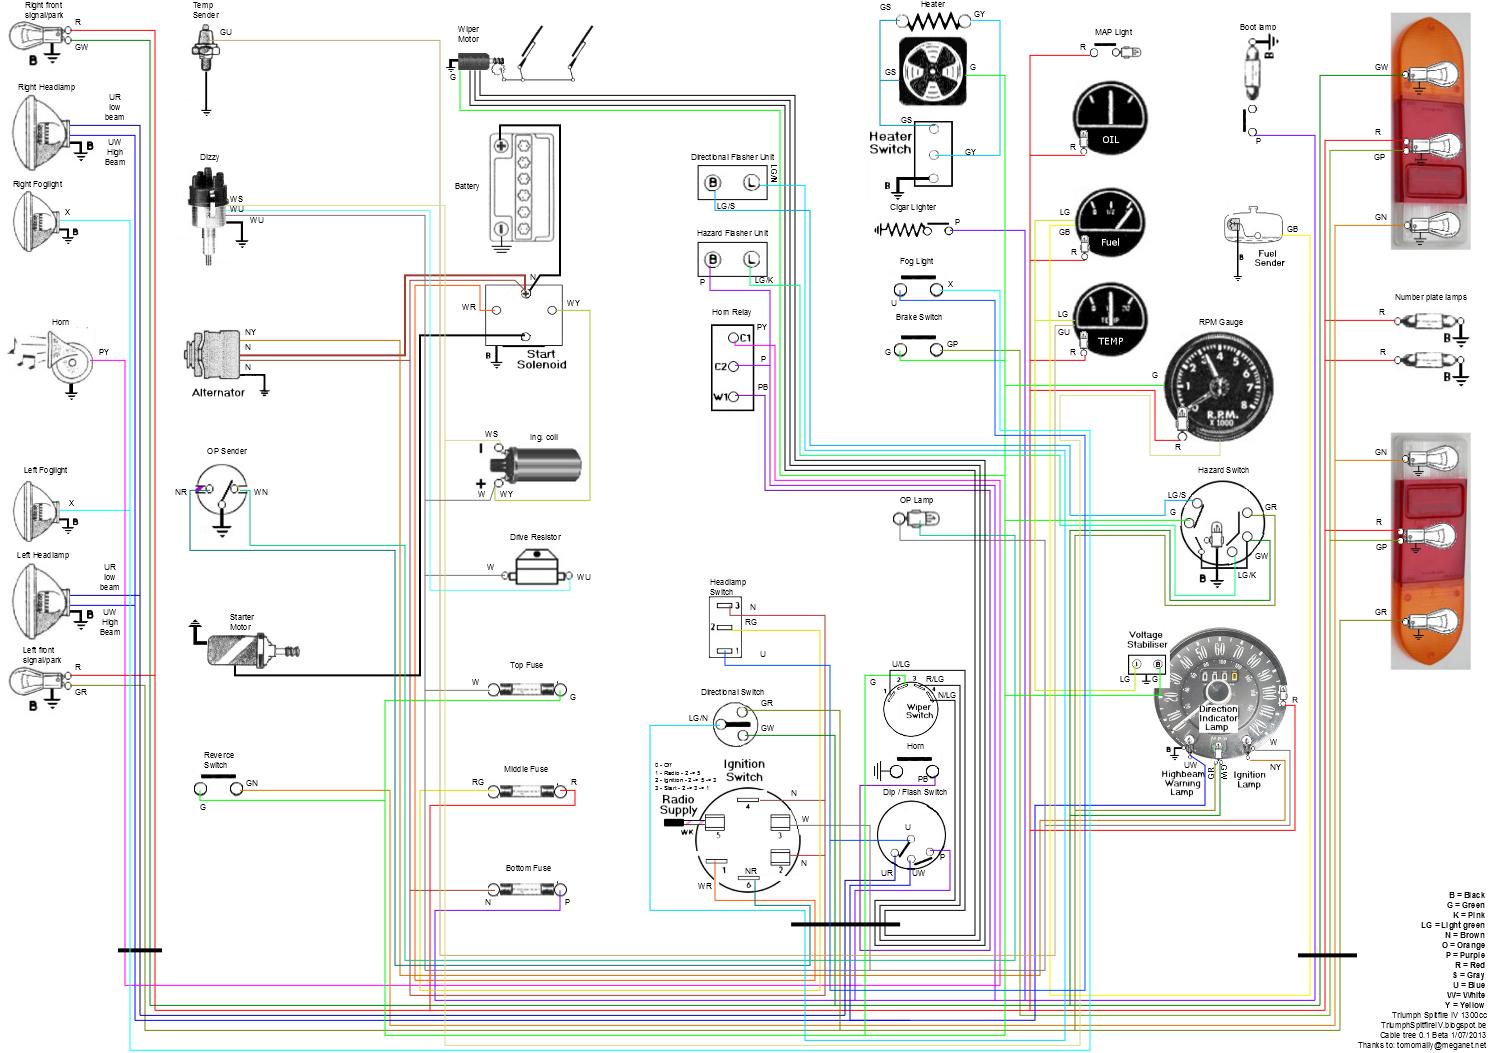 Spitfire MkIV Wiring Diagram   Triumph spitfire, Triumph, Fuse box Pinterest